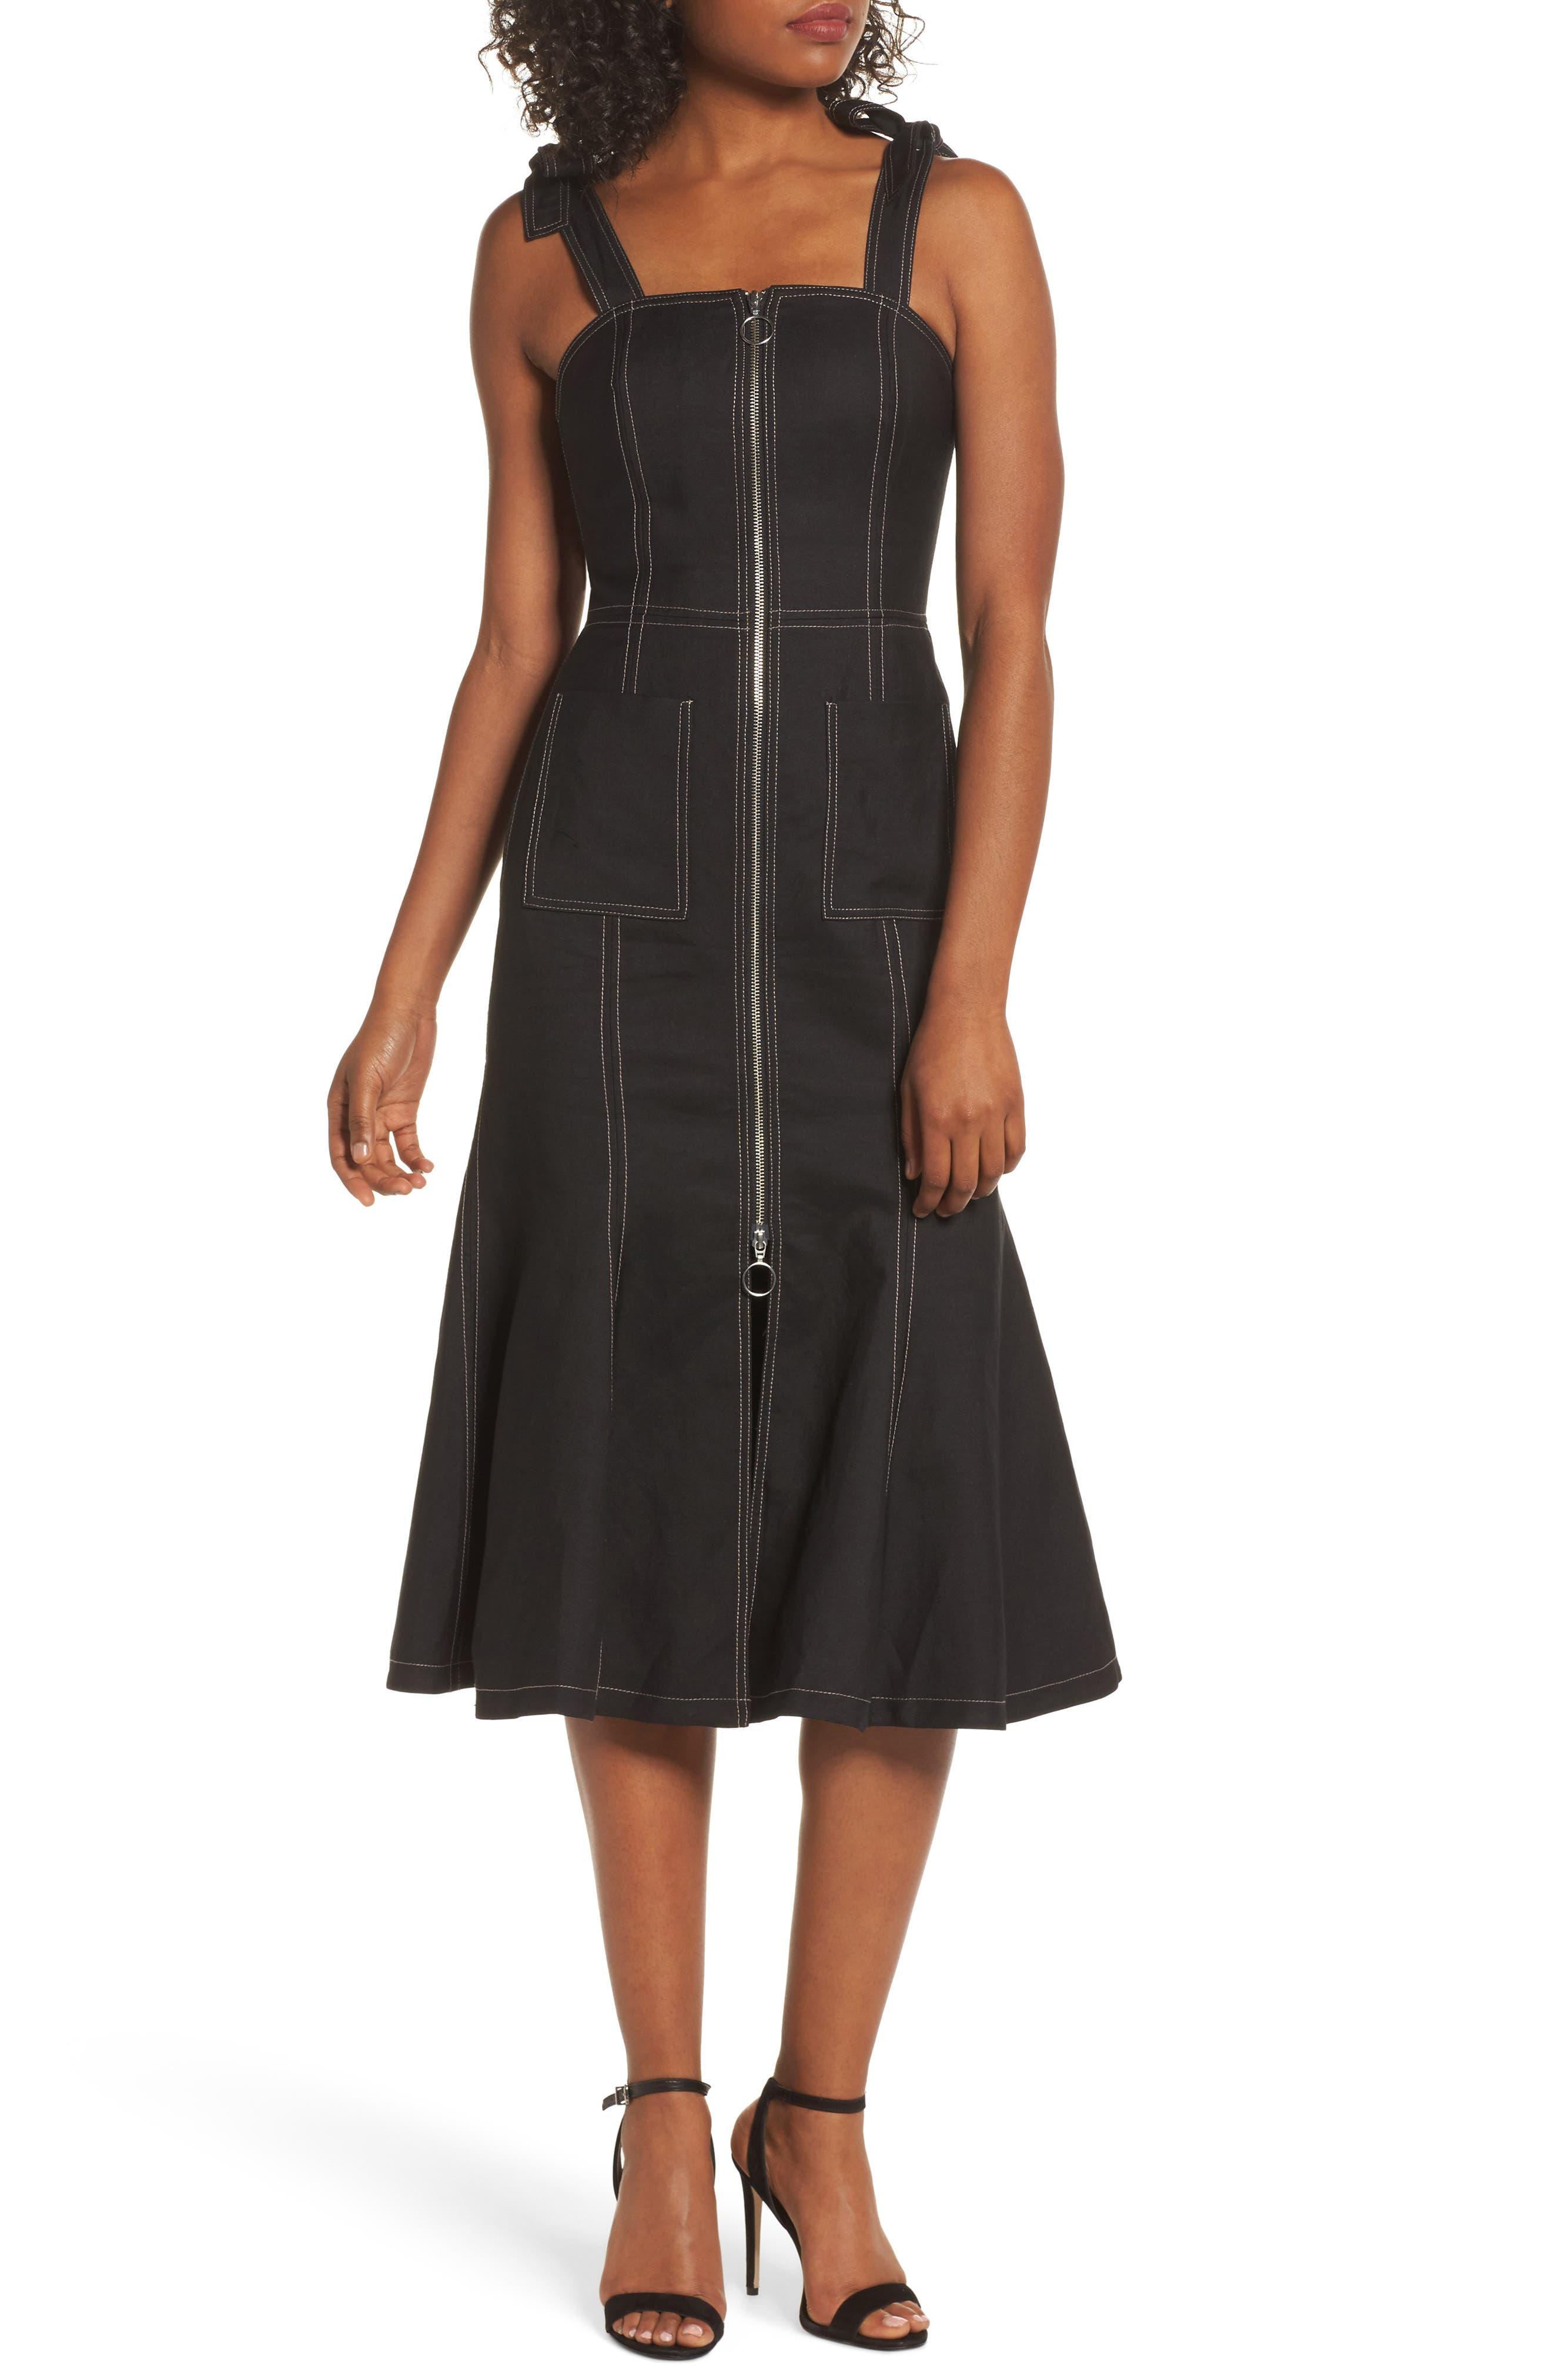 C/MEO Collective Get Right Shoulder Tie Midi Dress